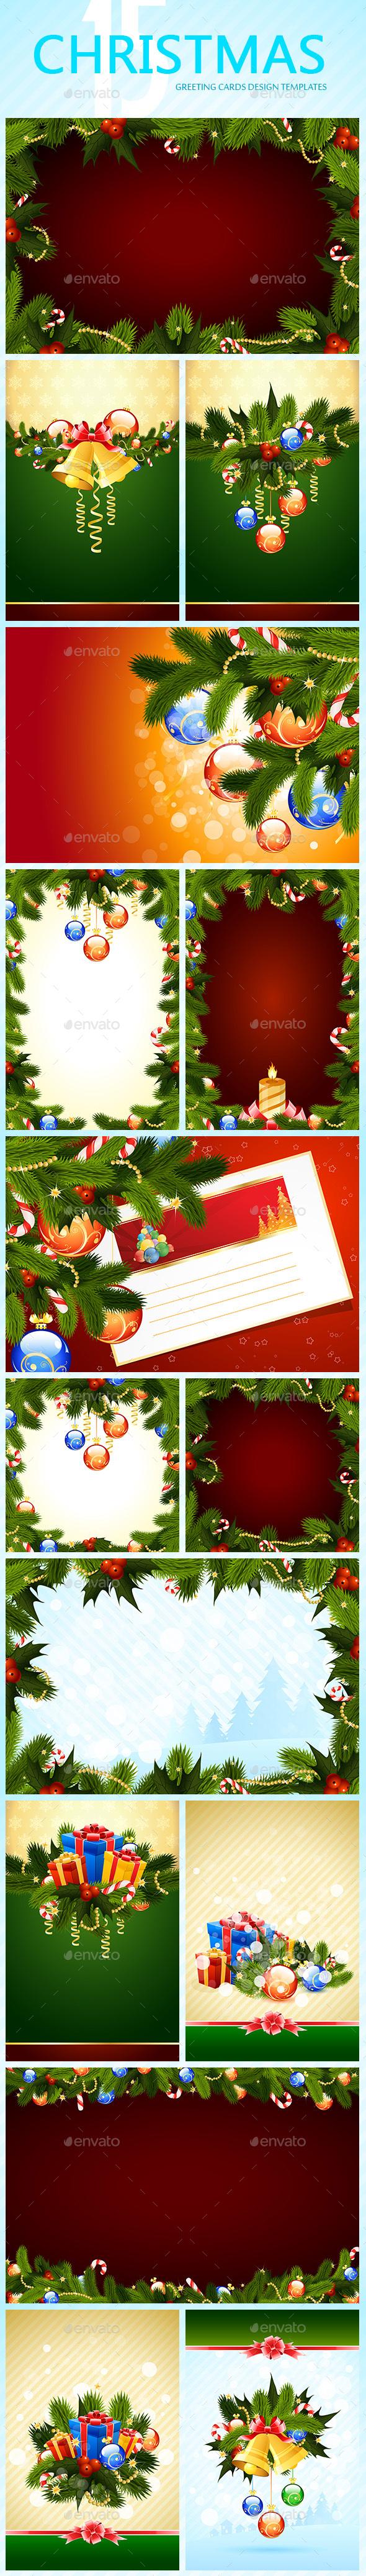 Set of Christmas Greeting Cards